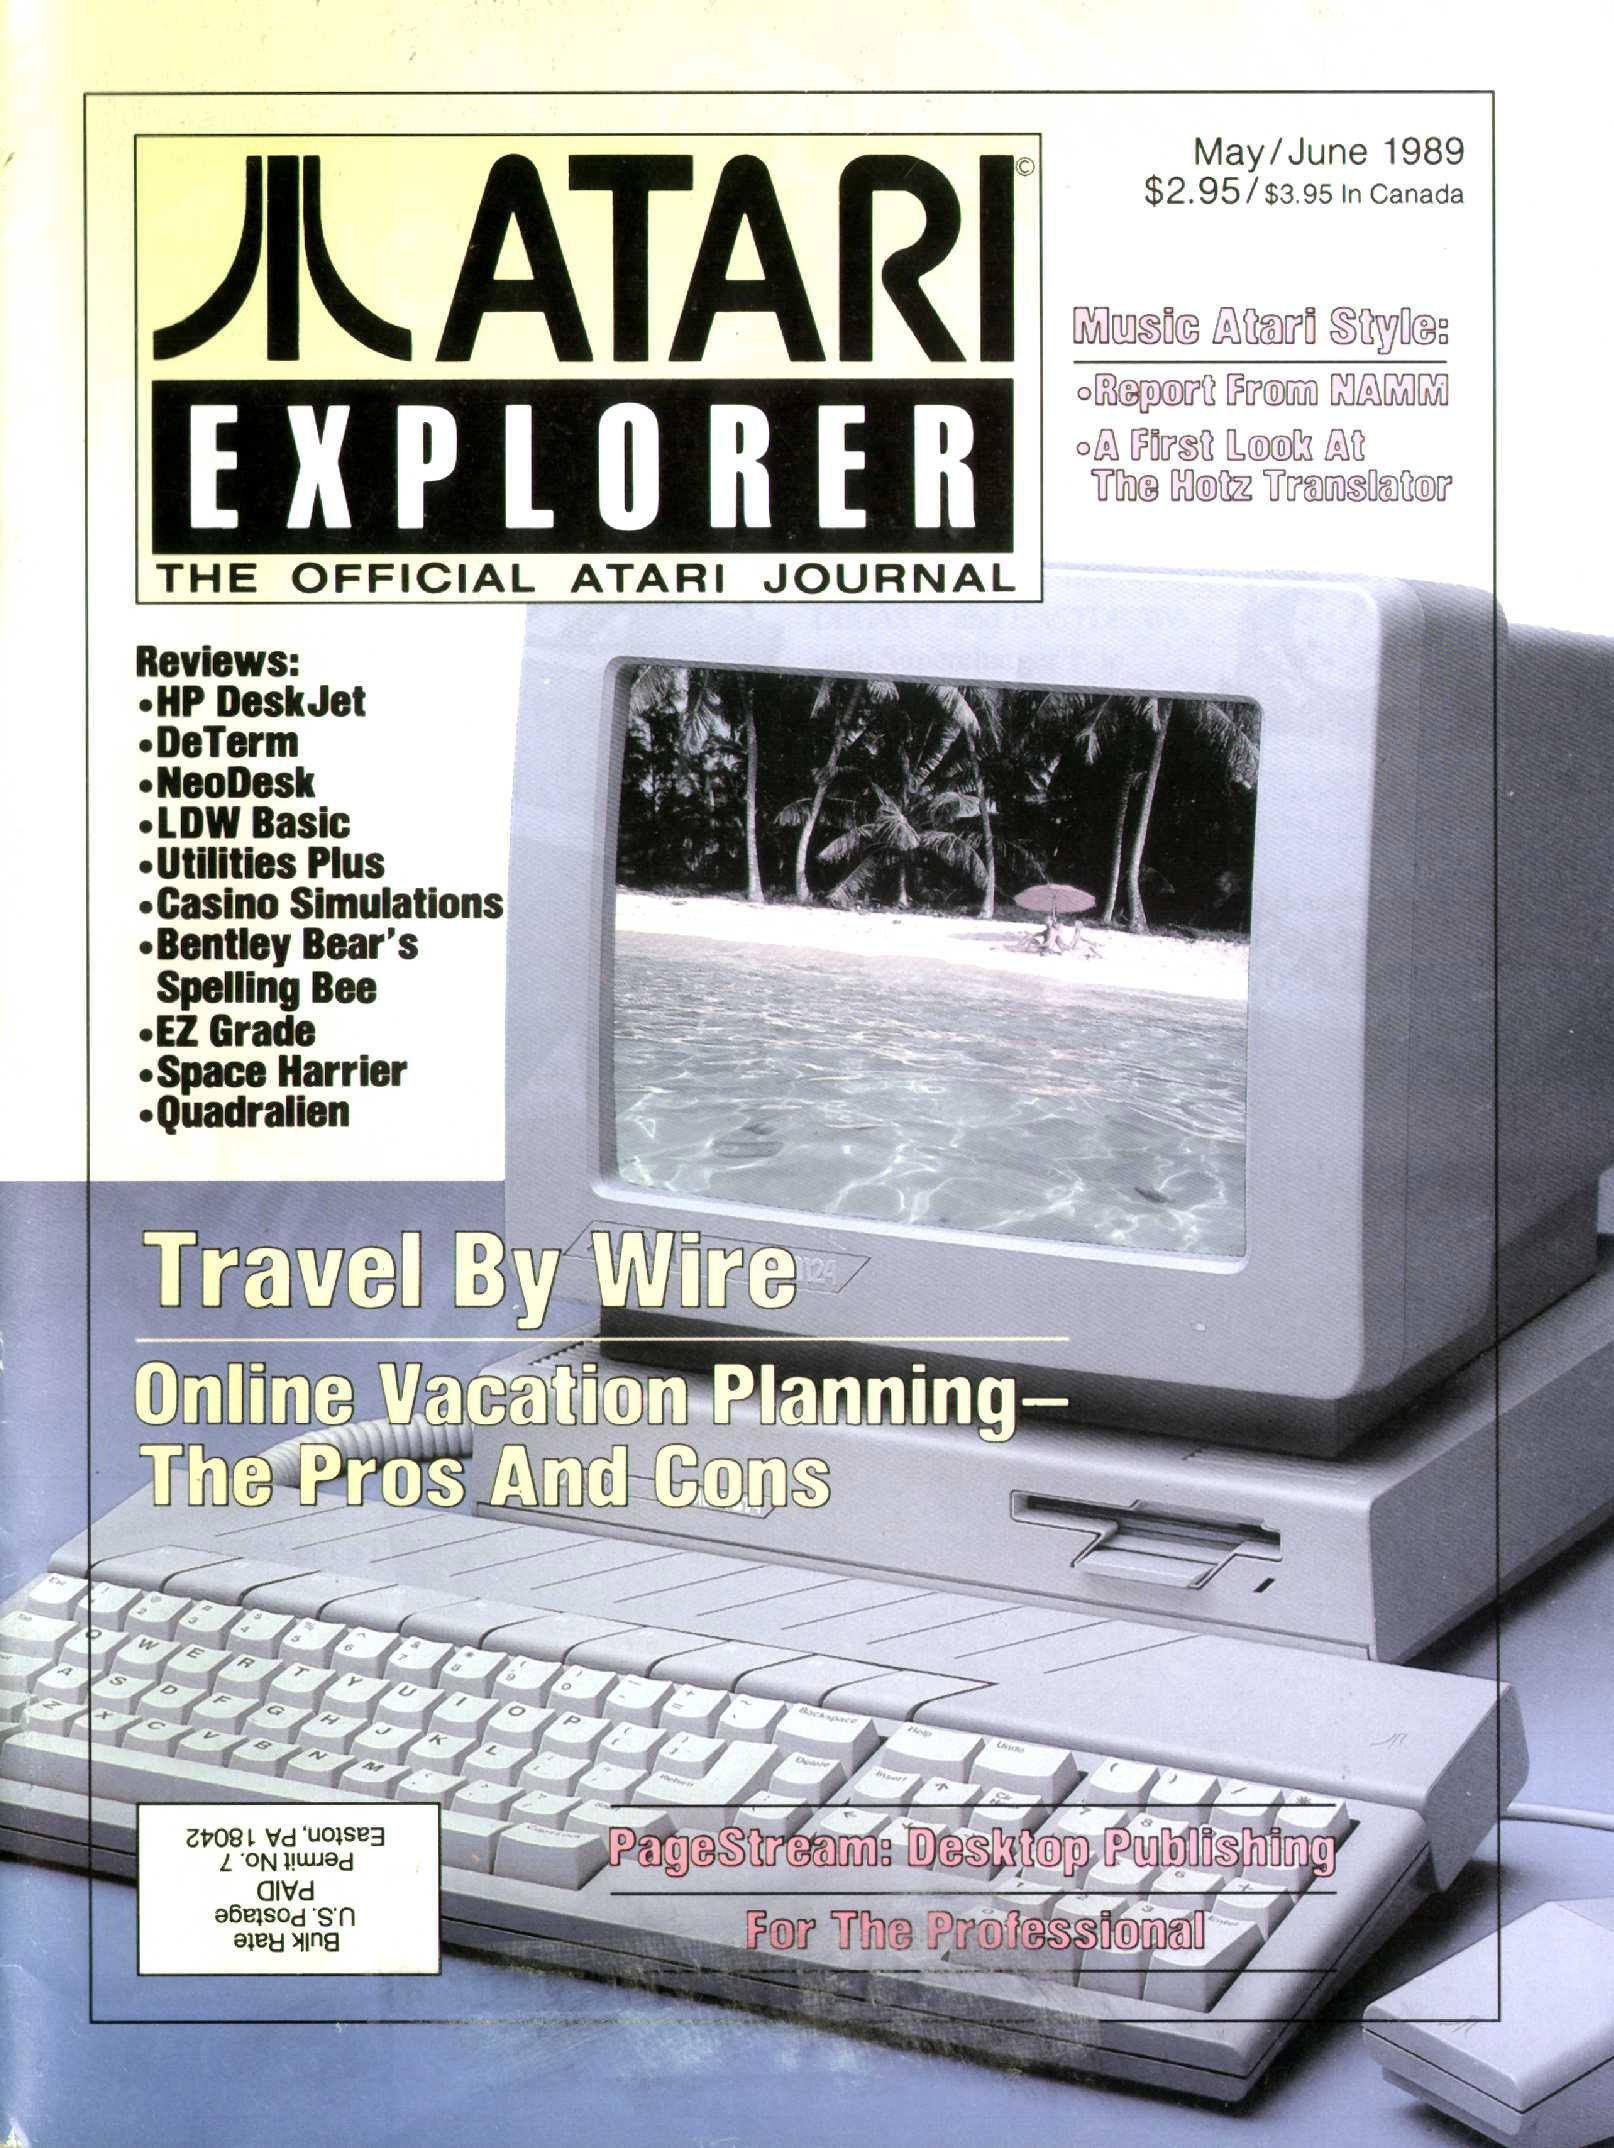 Atari Explorer Issue 20 (May / June 1989)